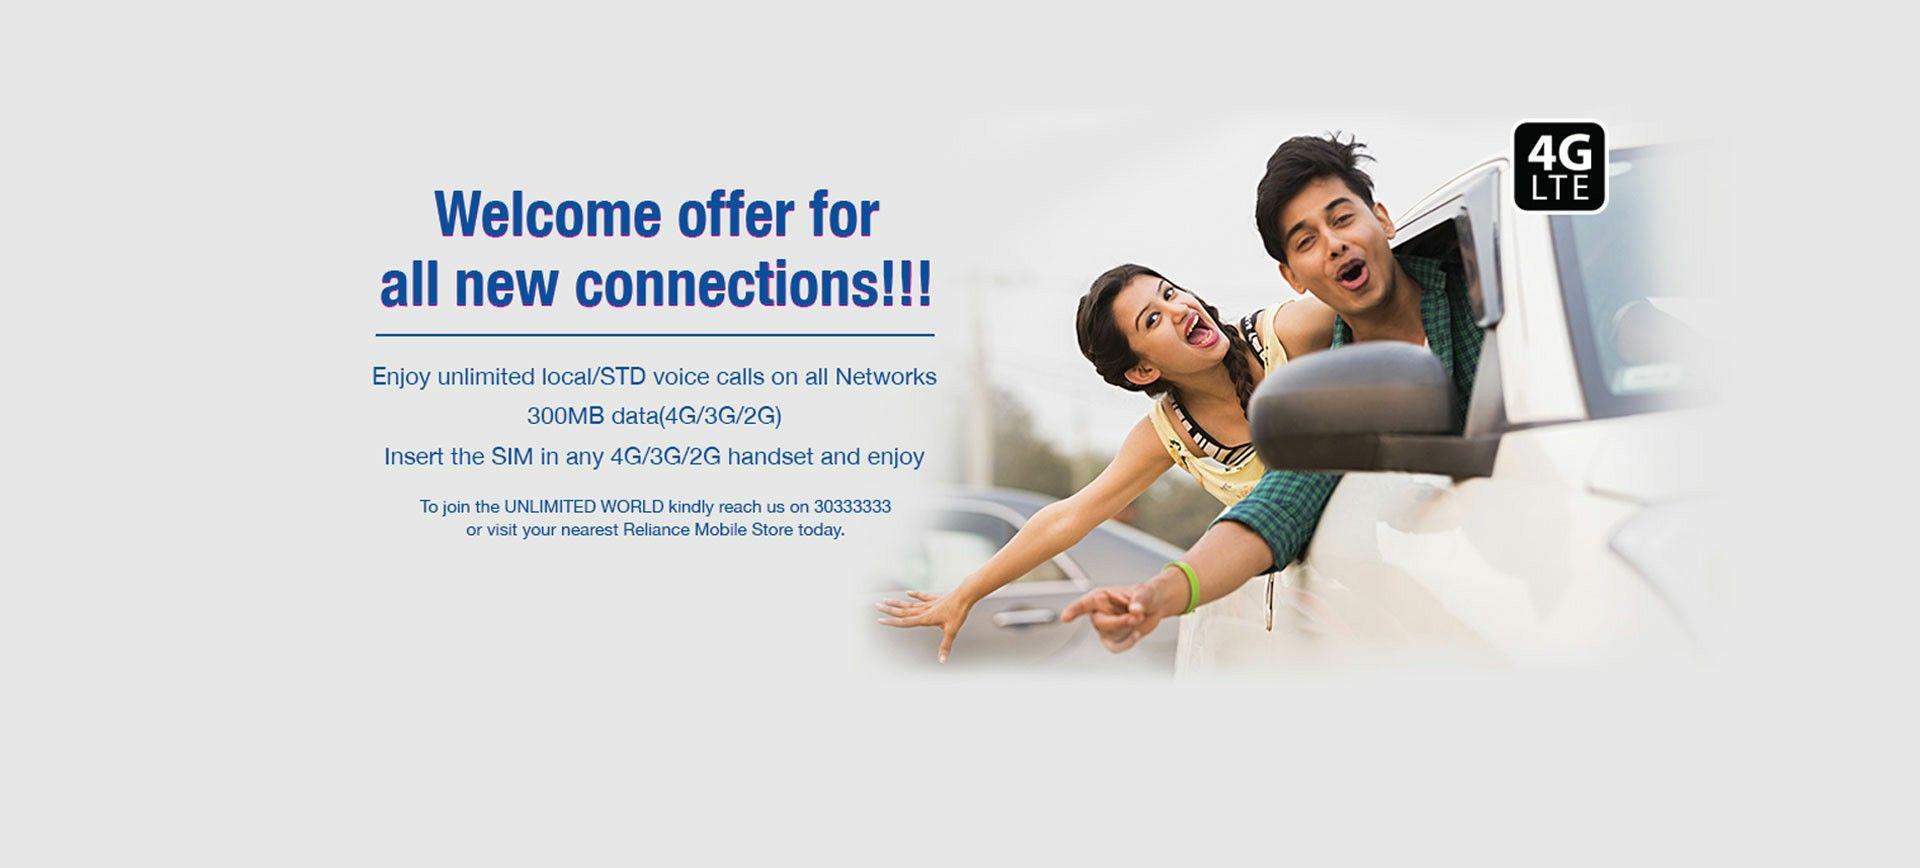 All social media free advertising contact 8608281118